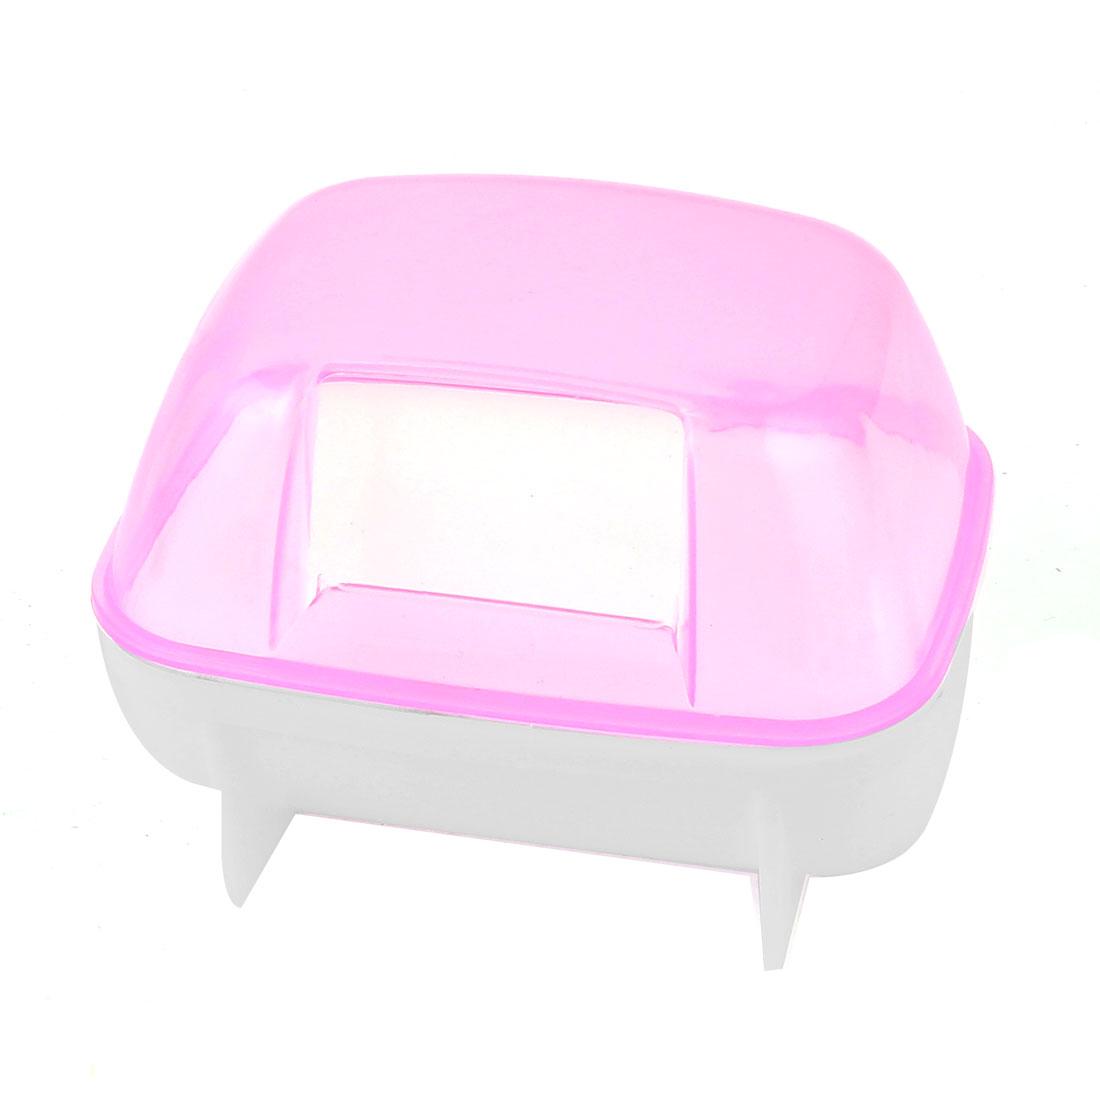 Plastic Detachable Pet Gerbil Hamster House Cage Playing Habitat Pink White